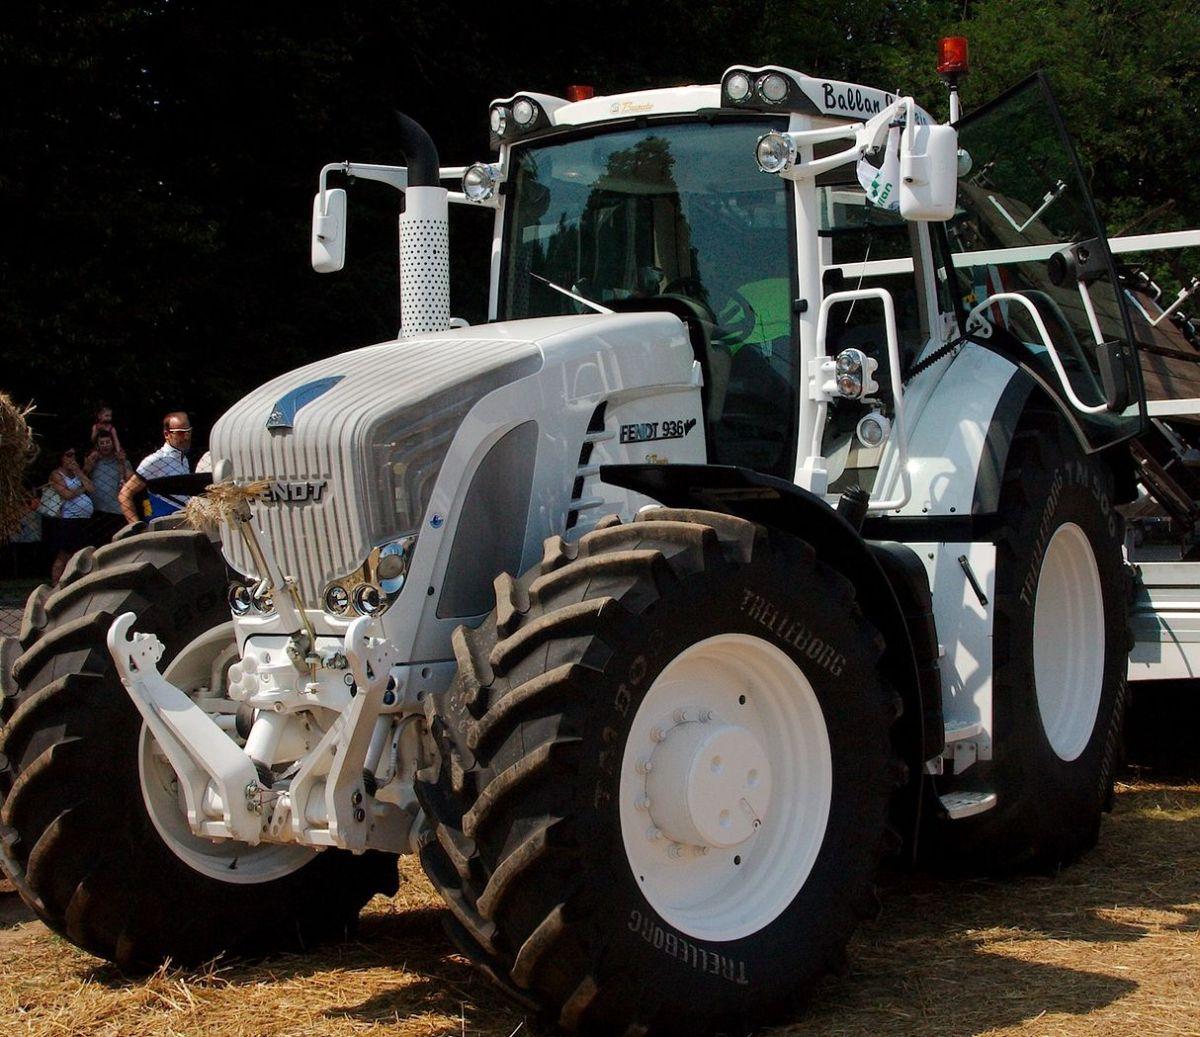 traktor Kreis Aichach-Friedberg | Autofahrer attackiert Traktorfahrer Aichach Friedberg News Polizei & Co Polizei Sielenbach Traktor |Presse Augsburg